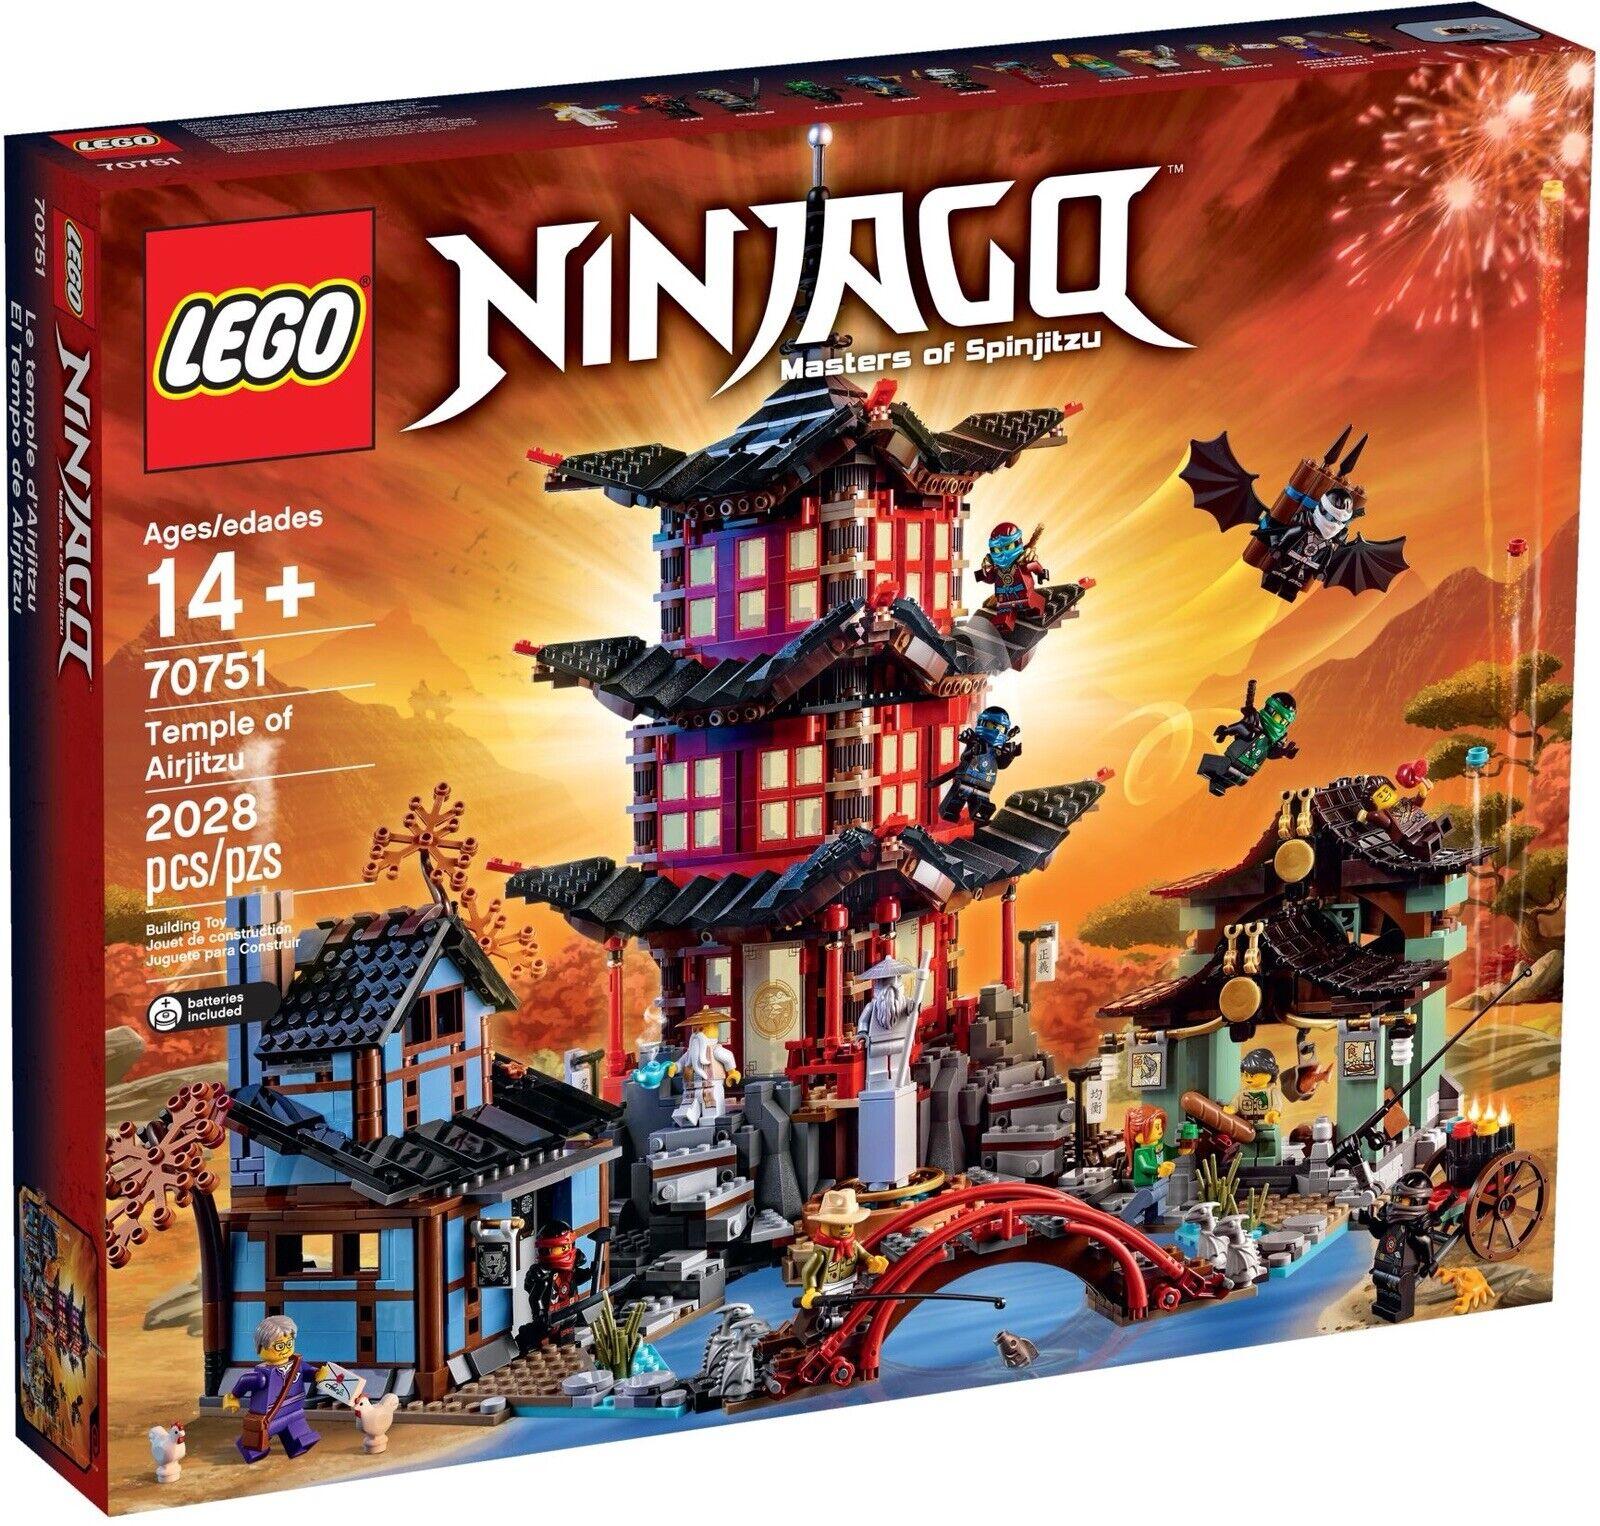 LEGO 70751 NINJAGO - TEMPIO DI AIRJITZU- NEW - SEALED - MISB